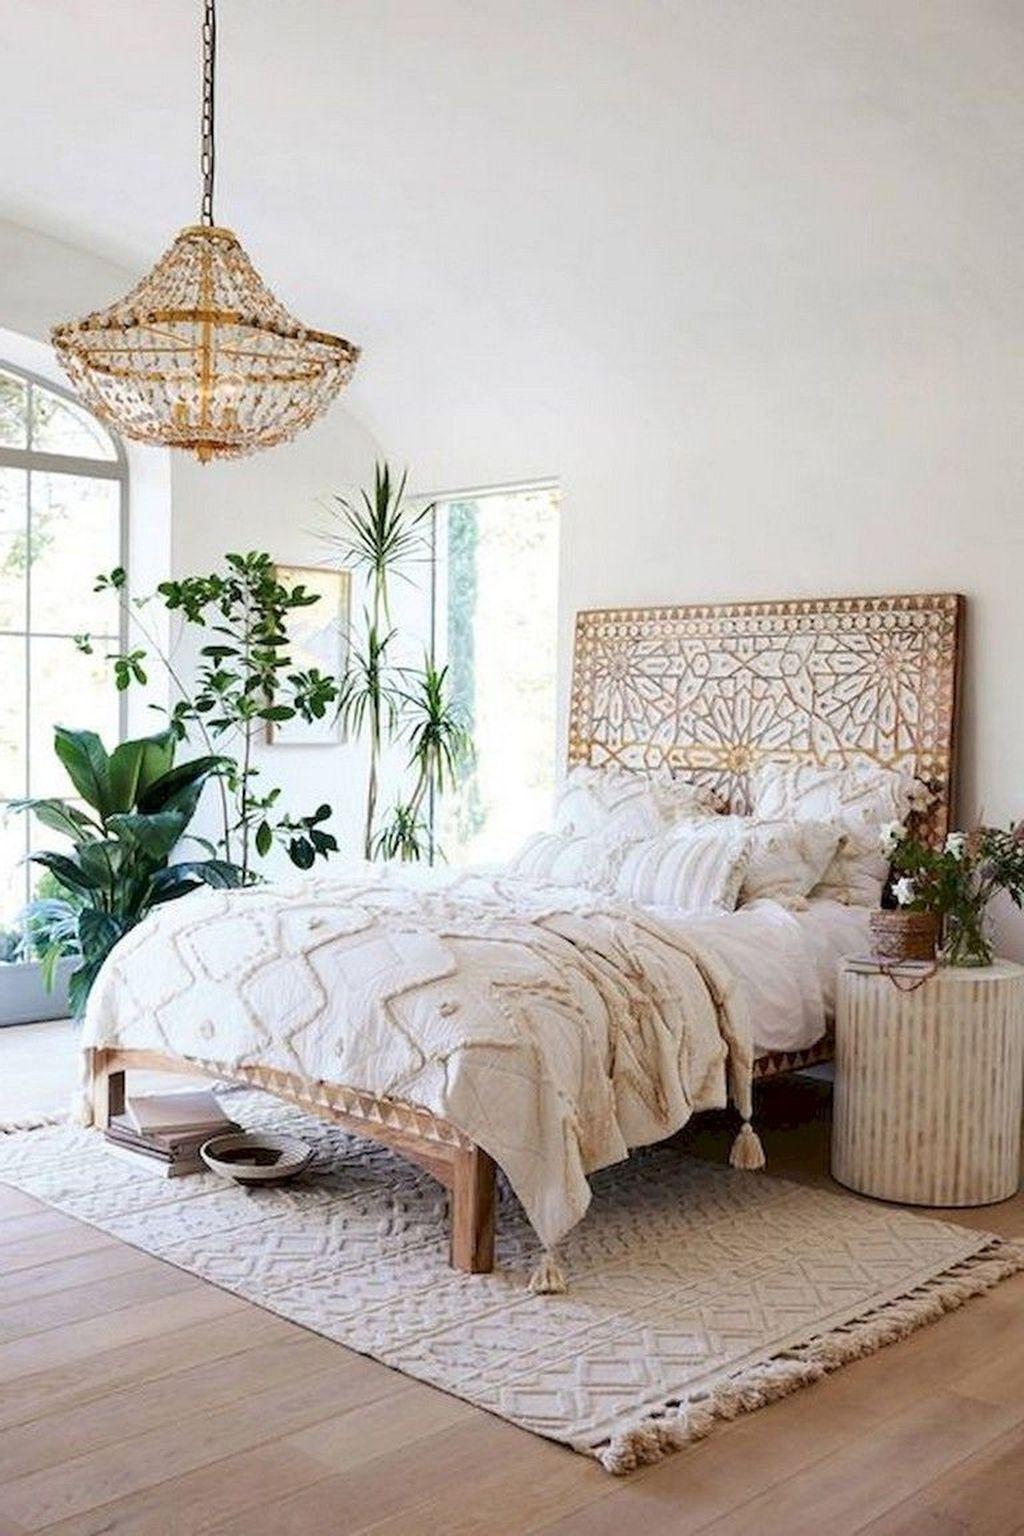 Lovely Minimalist Home Decor Idea